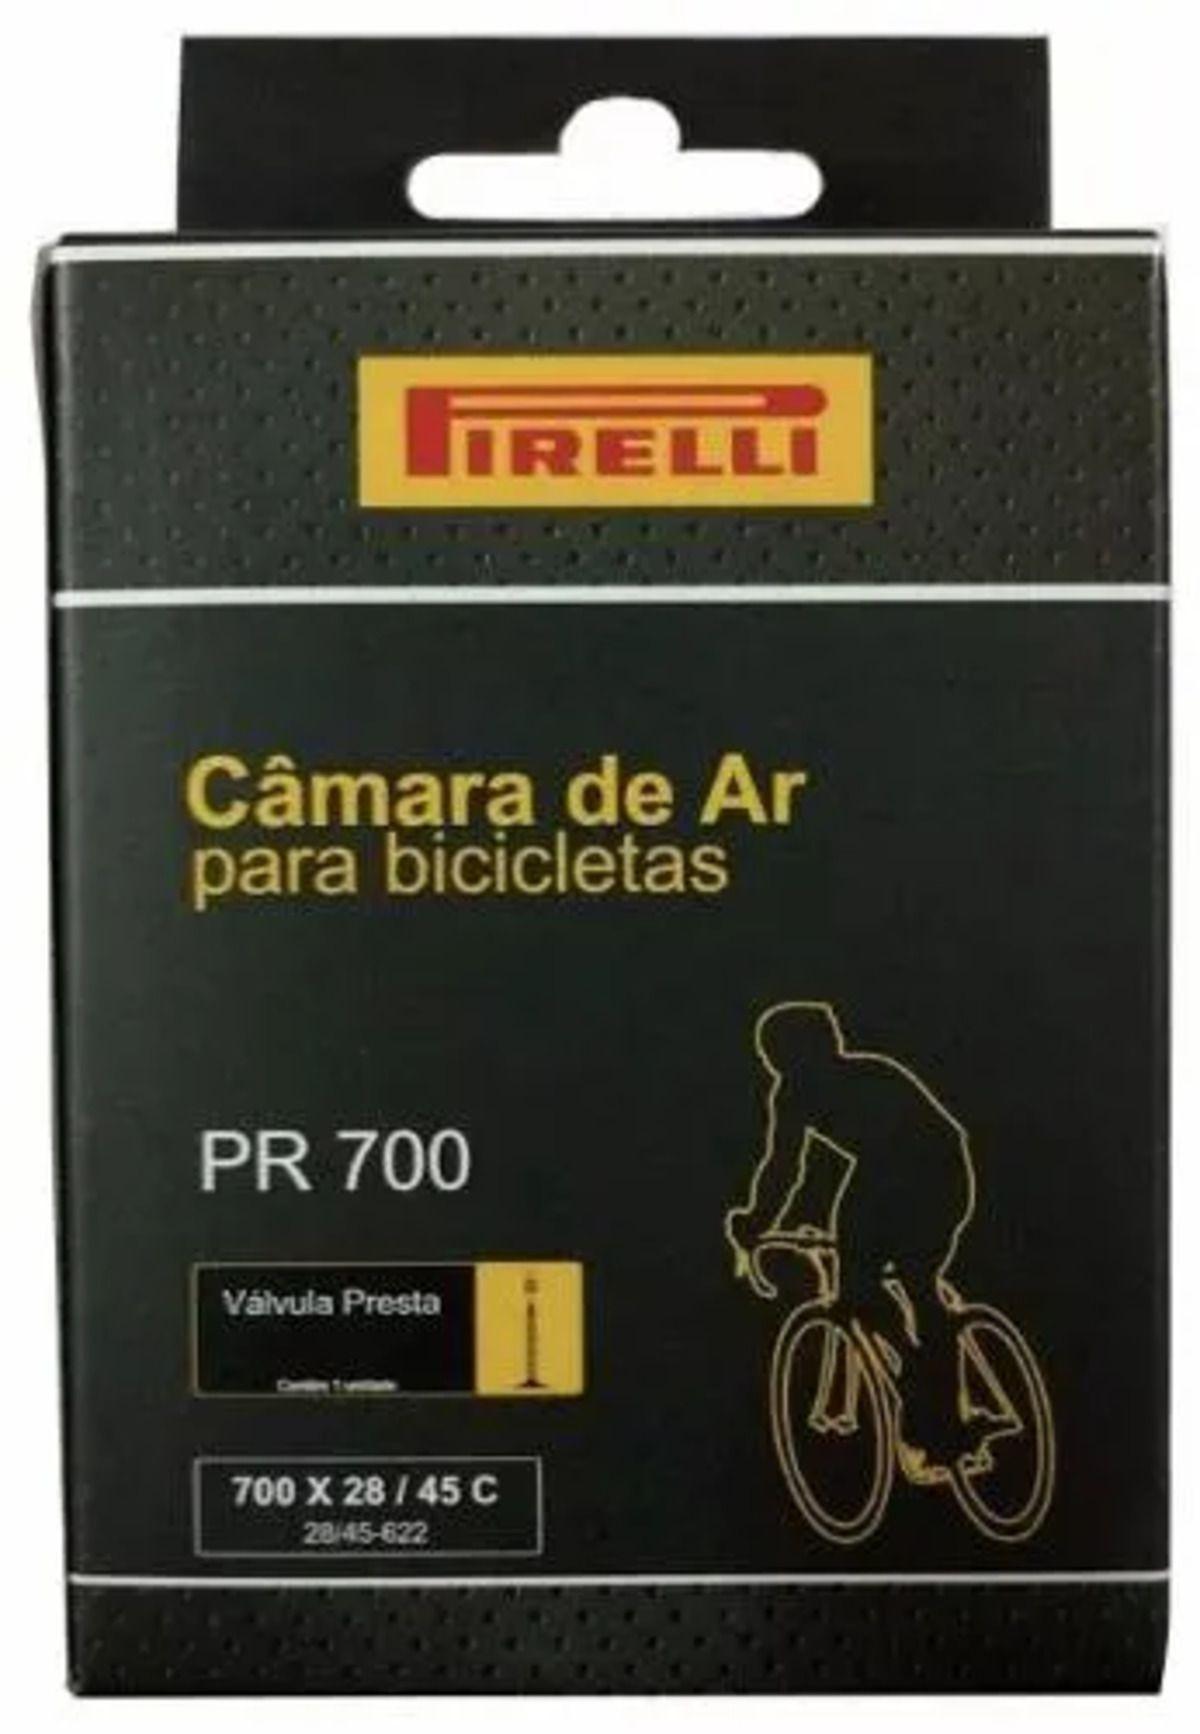 Kit Pneu Pirelli Corsa Aramado 700x23 com Camara Pirelli 700